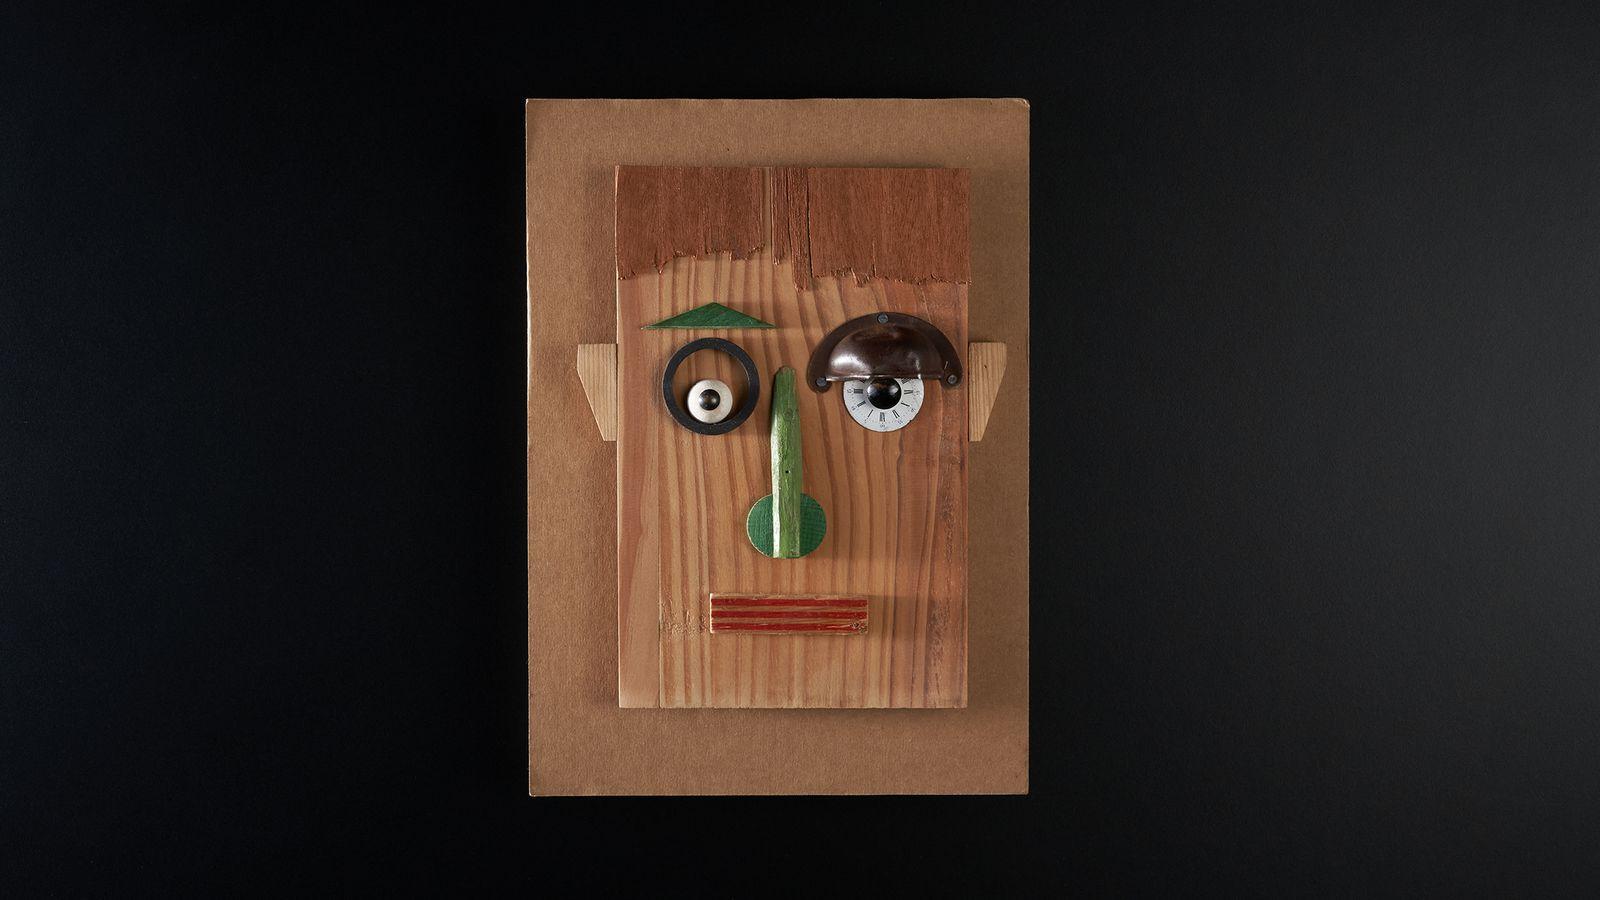 Familiar faces - CE - cover.jpg